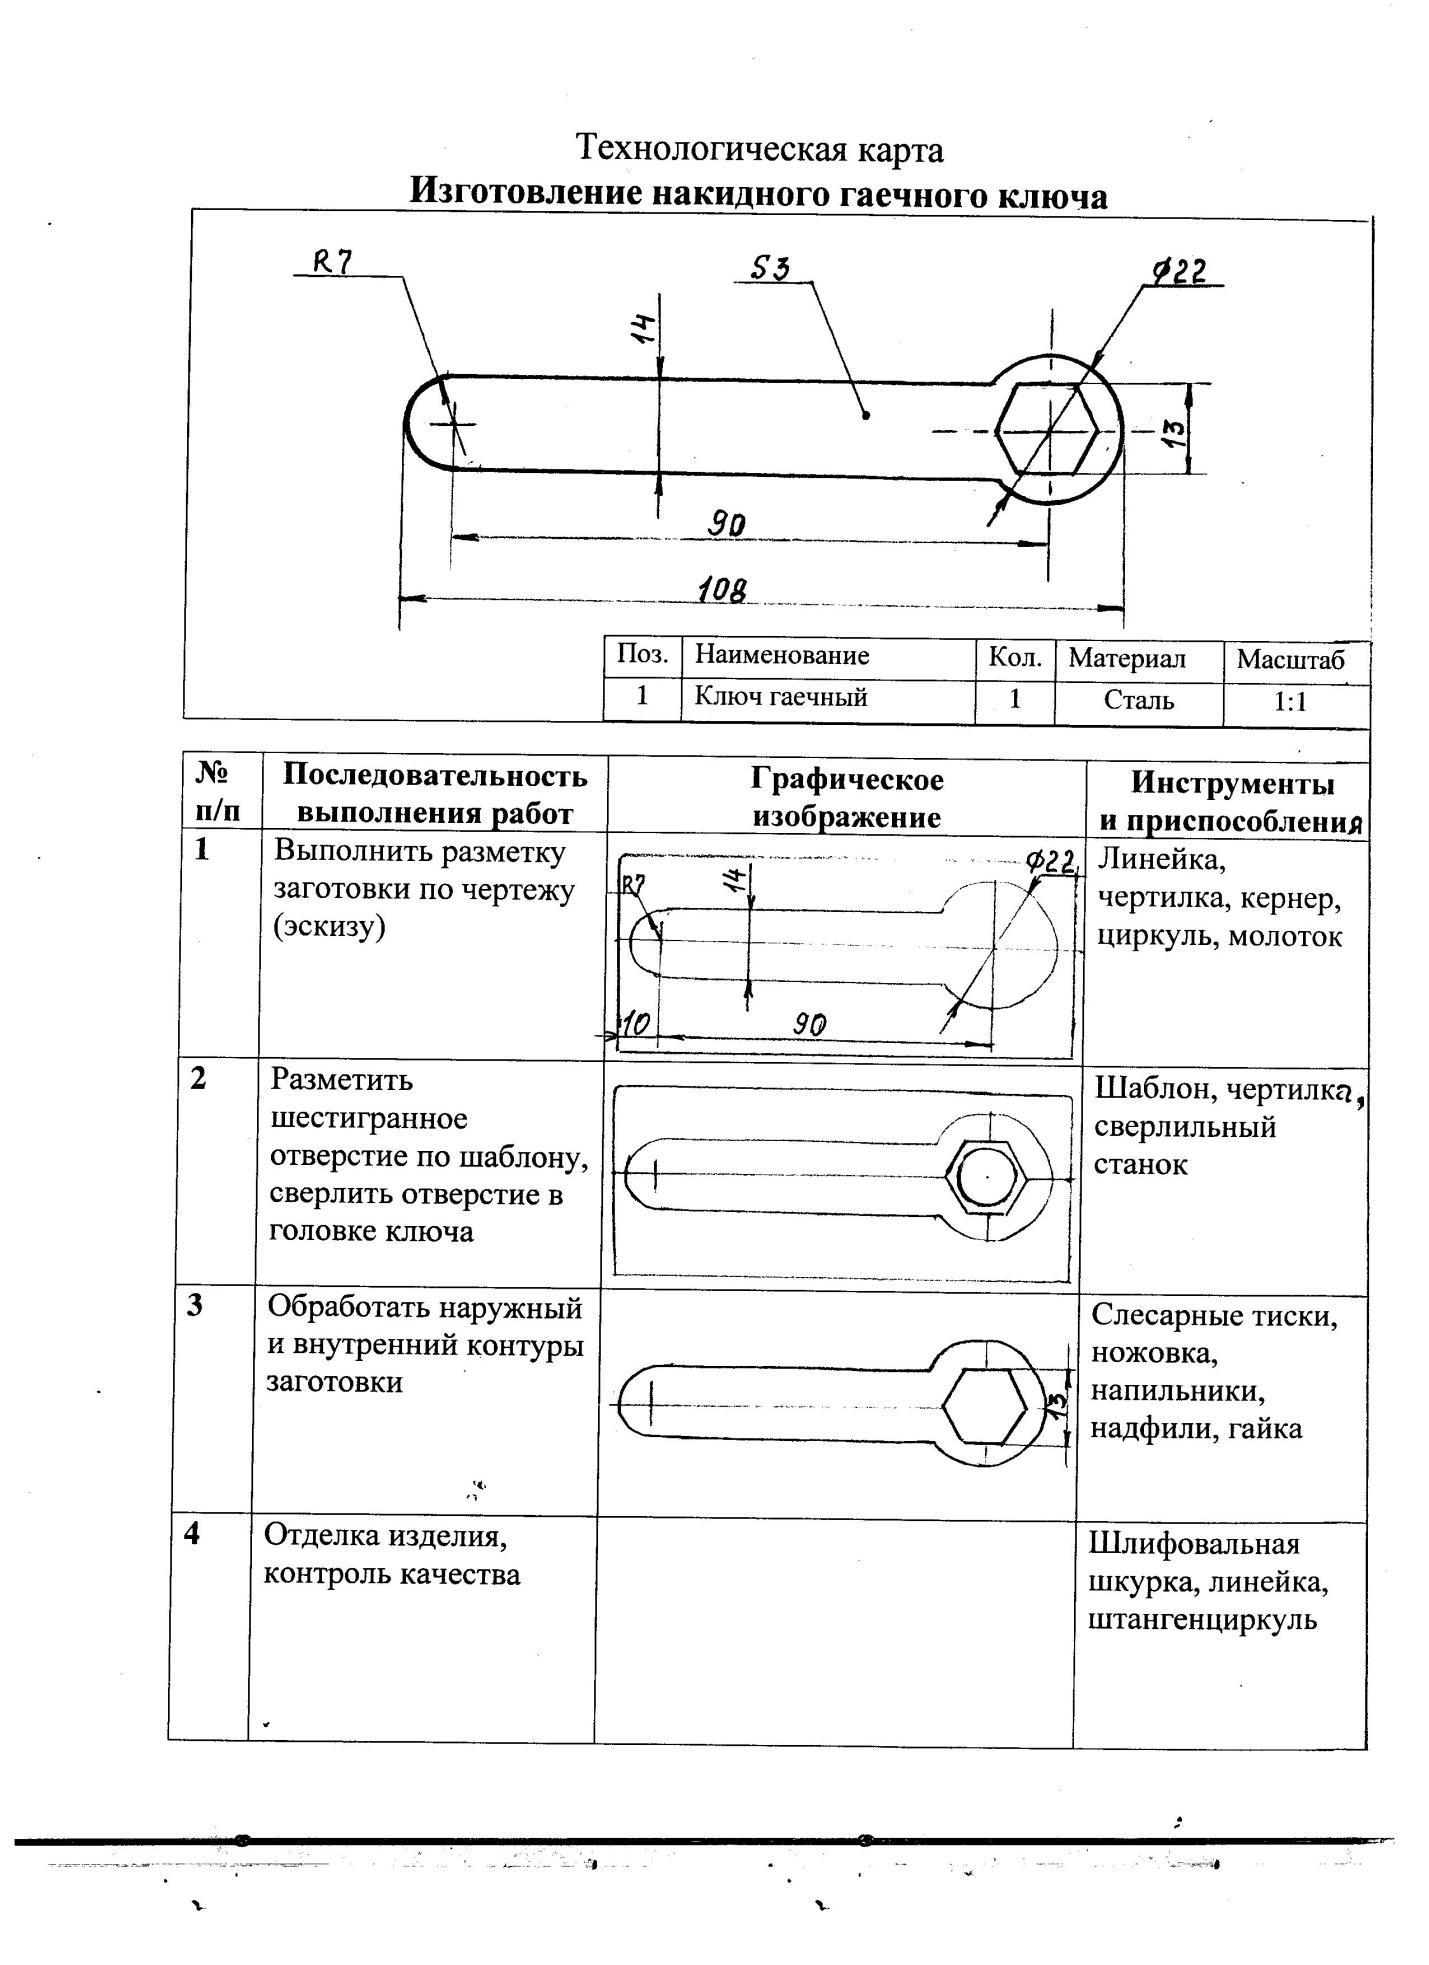 D:\Александр\КУРСЫ ФГОС КОМП\С.Р. № 3 Ш\Рисунок (3) (1).jpg